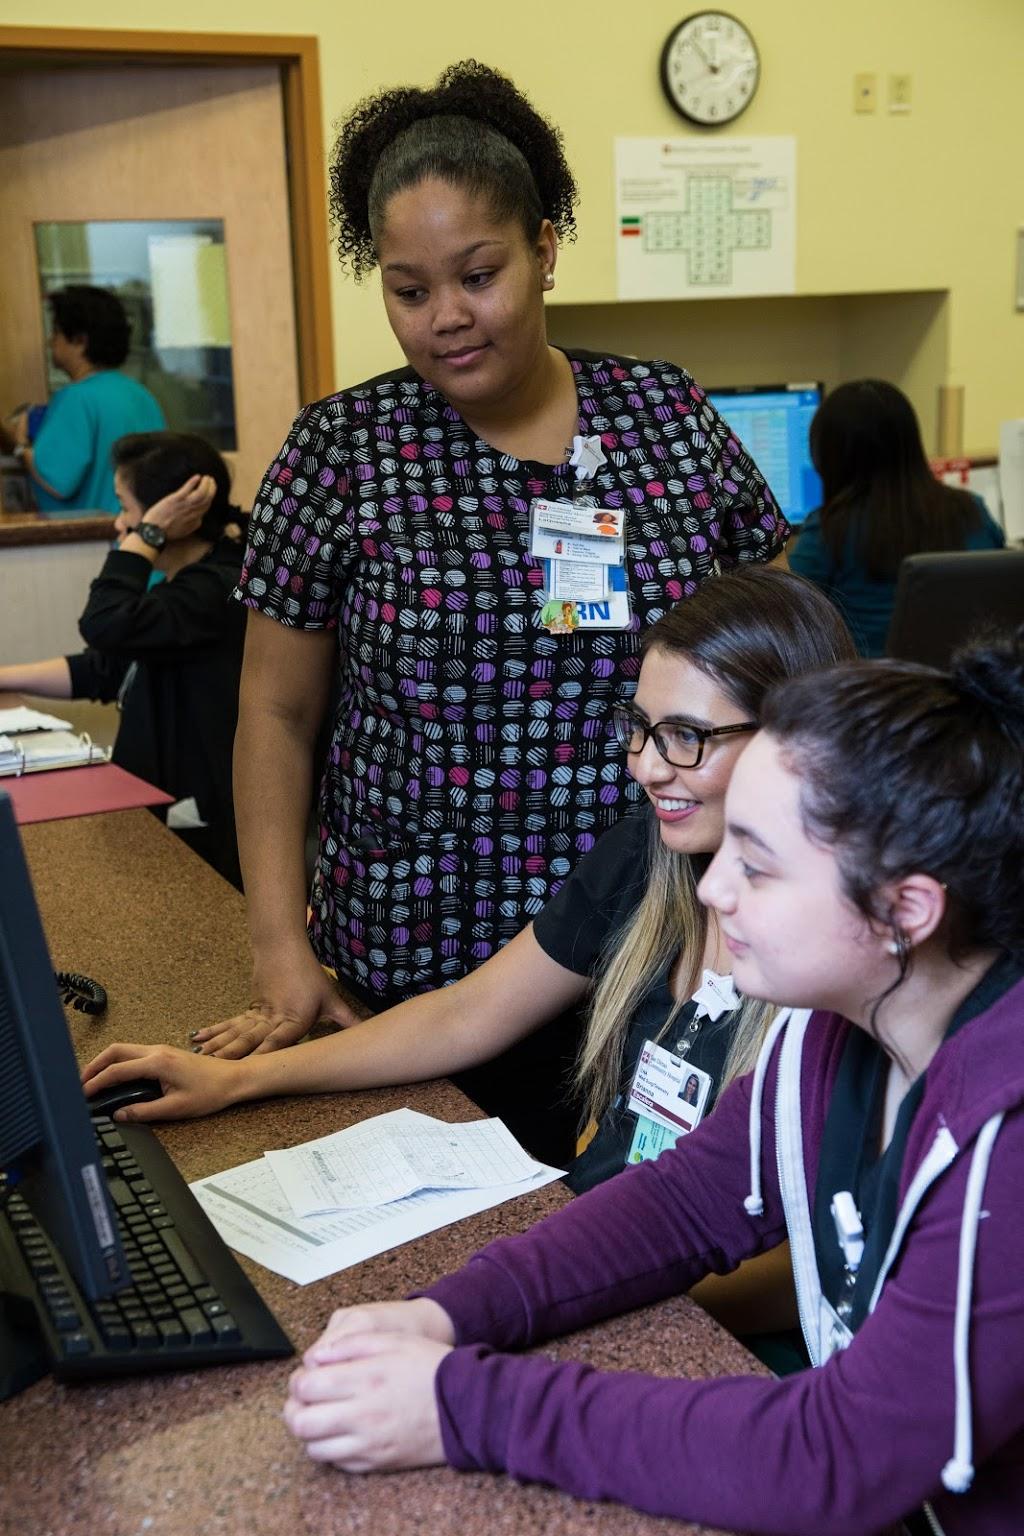 San Dimas Community Hospital: Family Birth Center - health  | Photo 8 of 10 | Address: 1350 W Covina Blvd, San Dimas, CA 91773, USA | Phone: (909) 343-5736